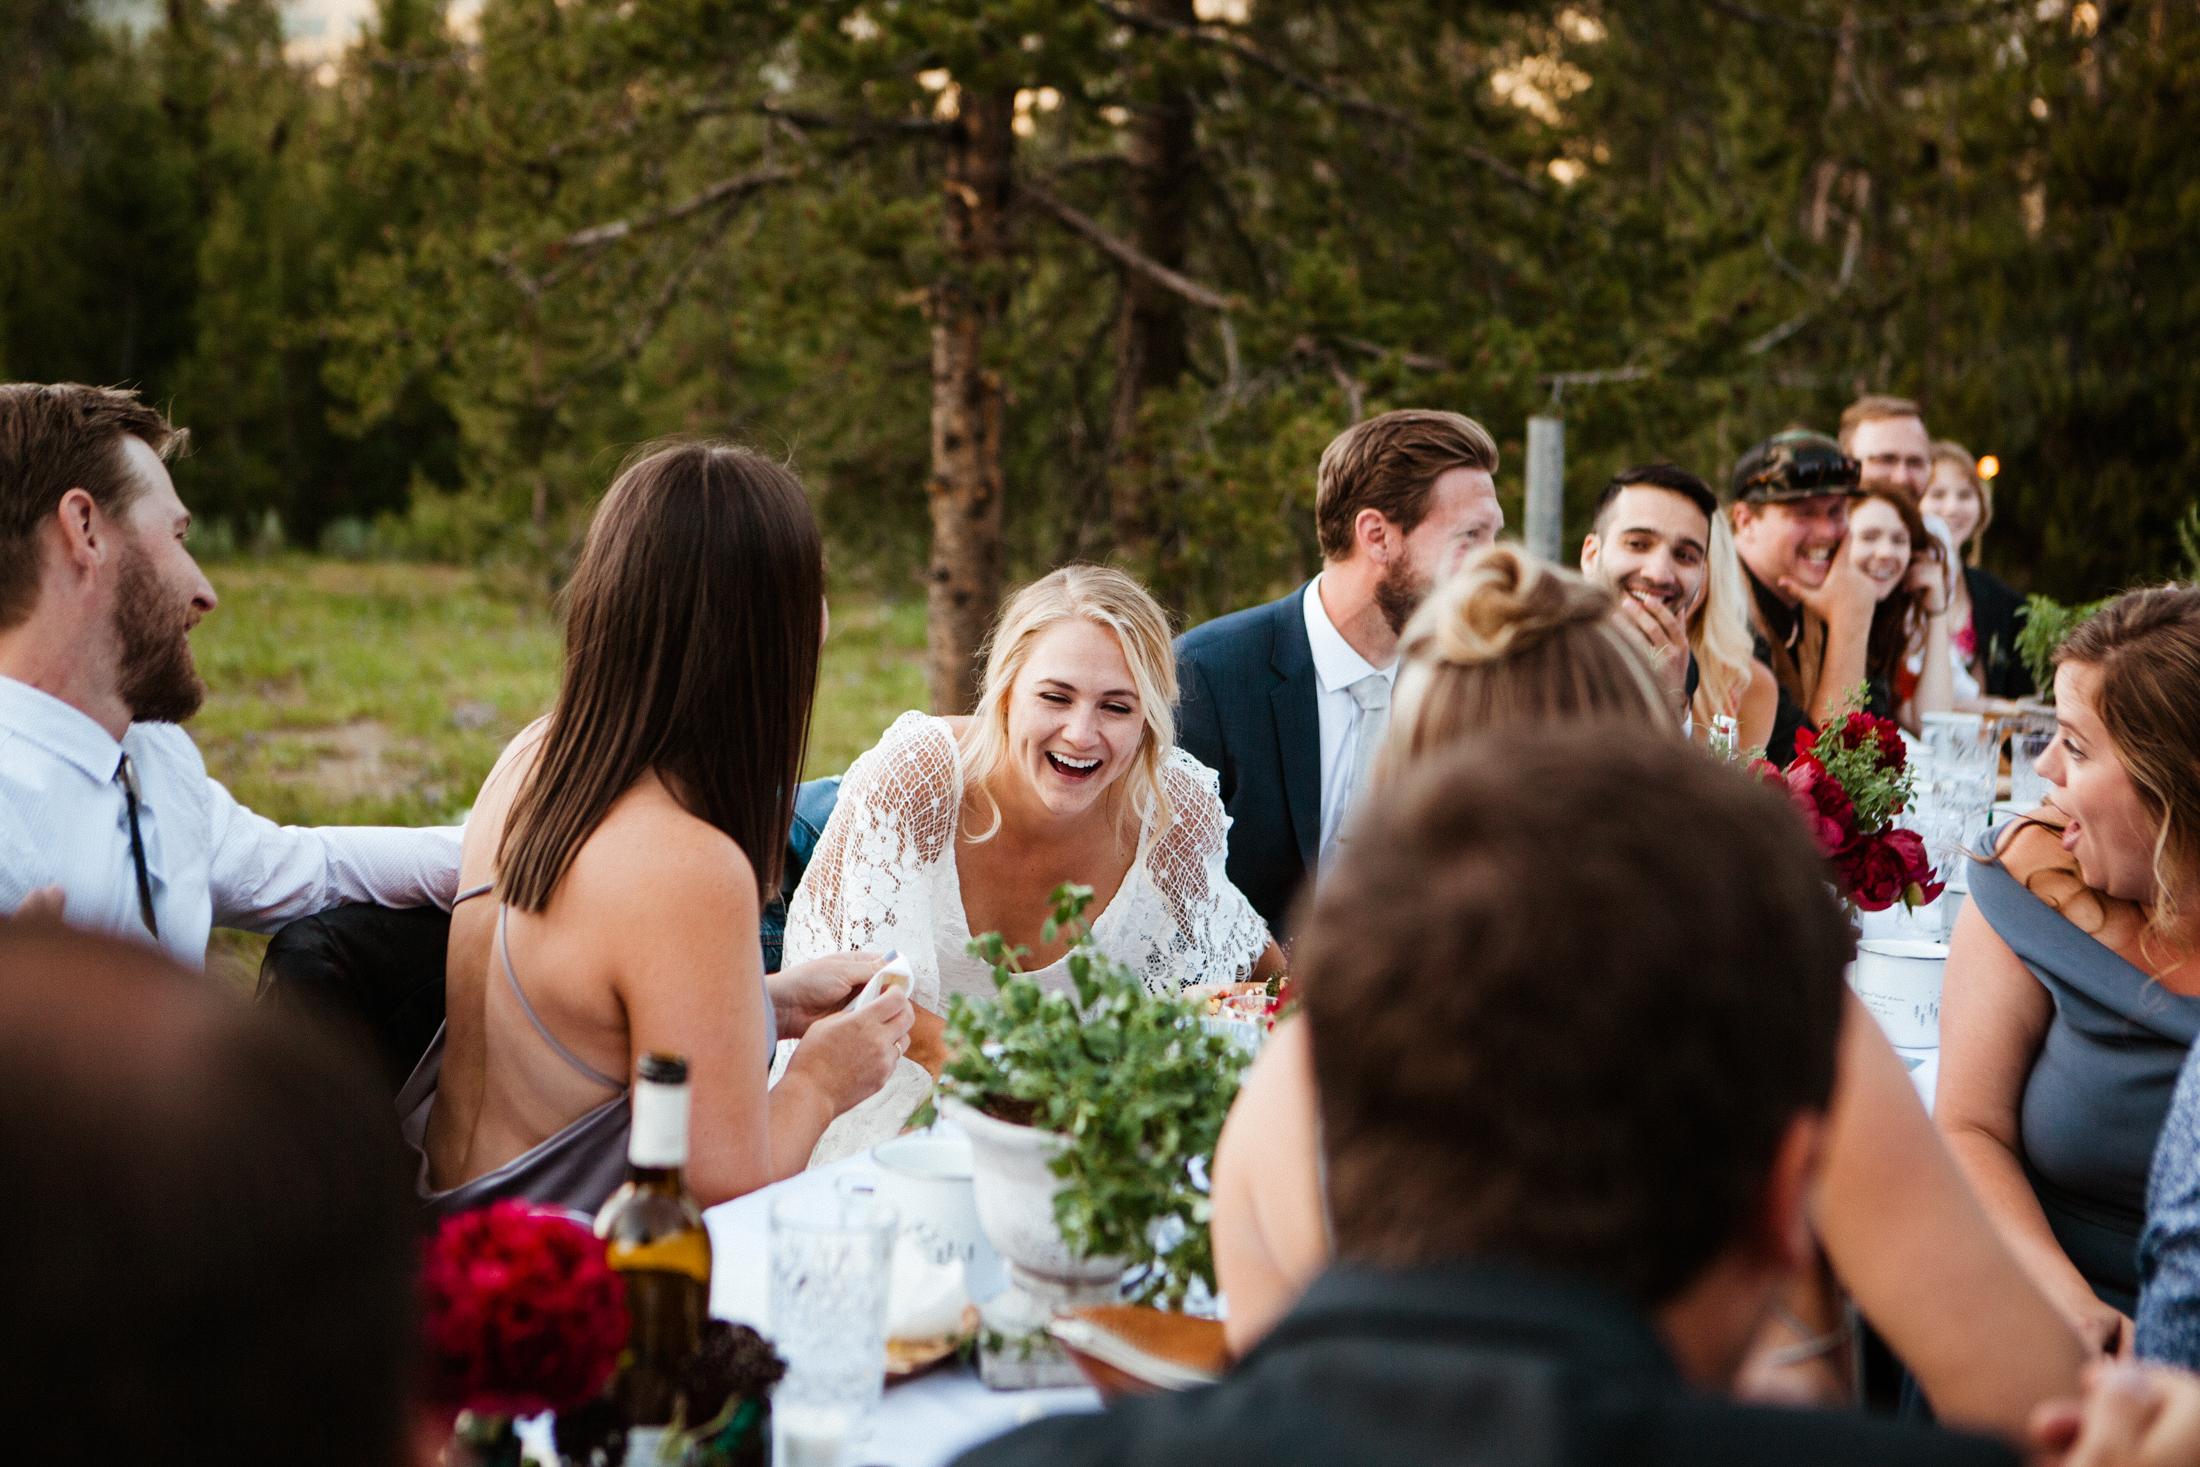 idaho-4h-camp-wedding-christinemarie-184.jpg